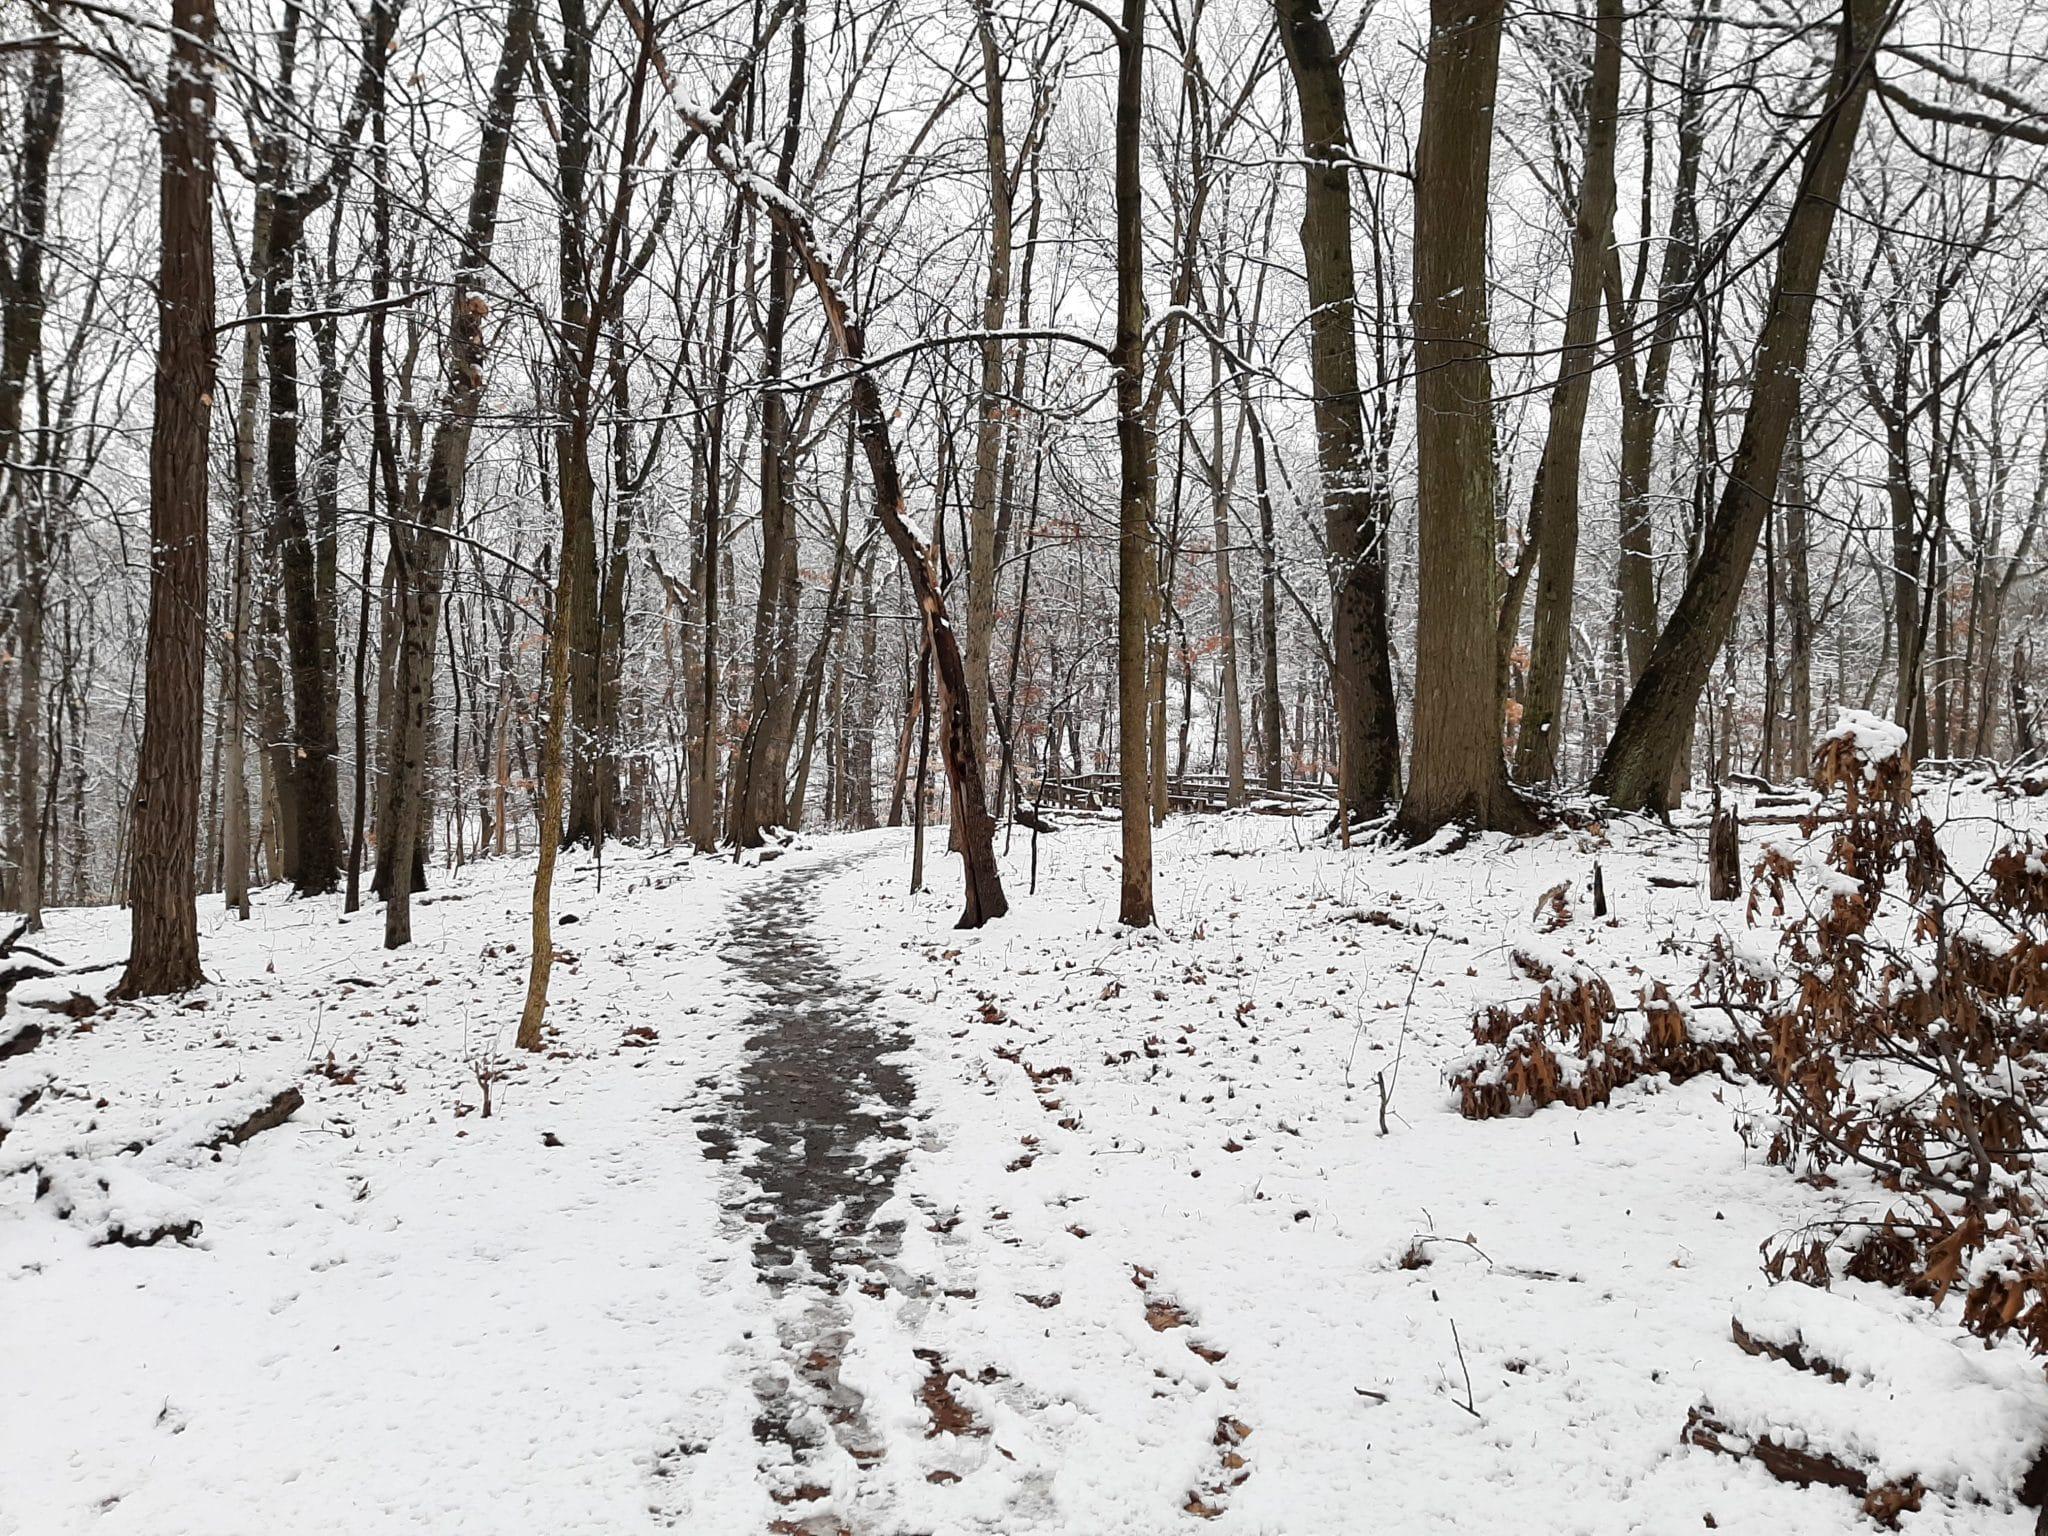 Trees in winter snow